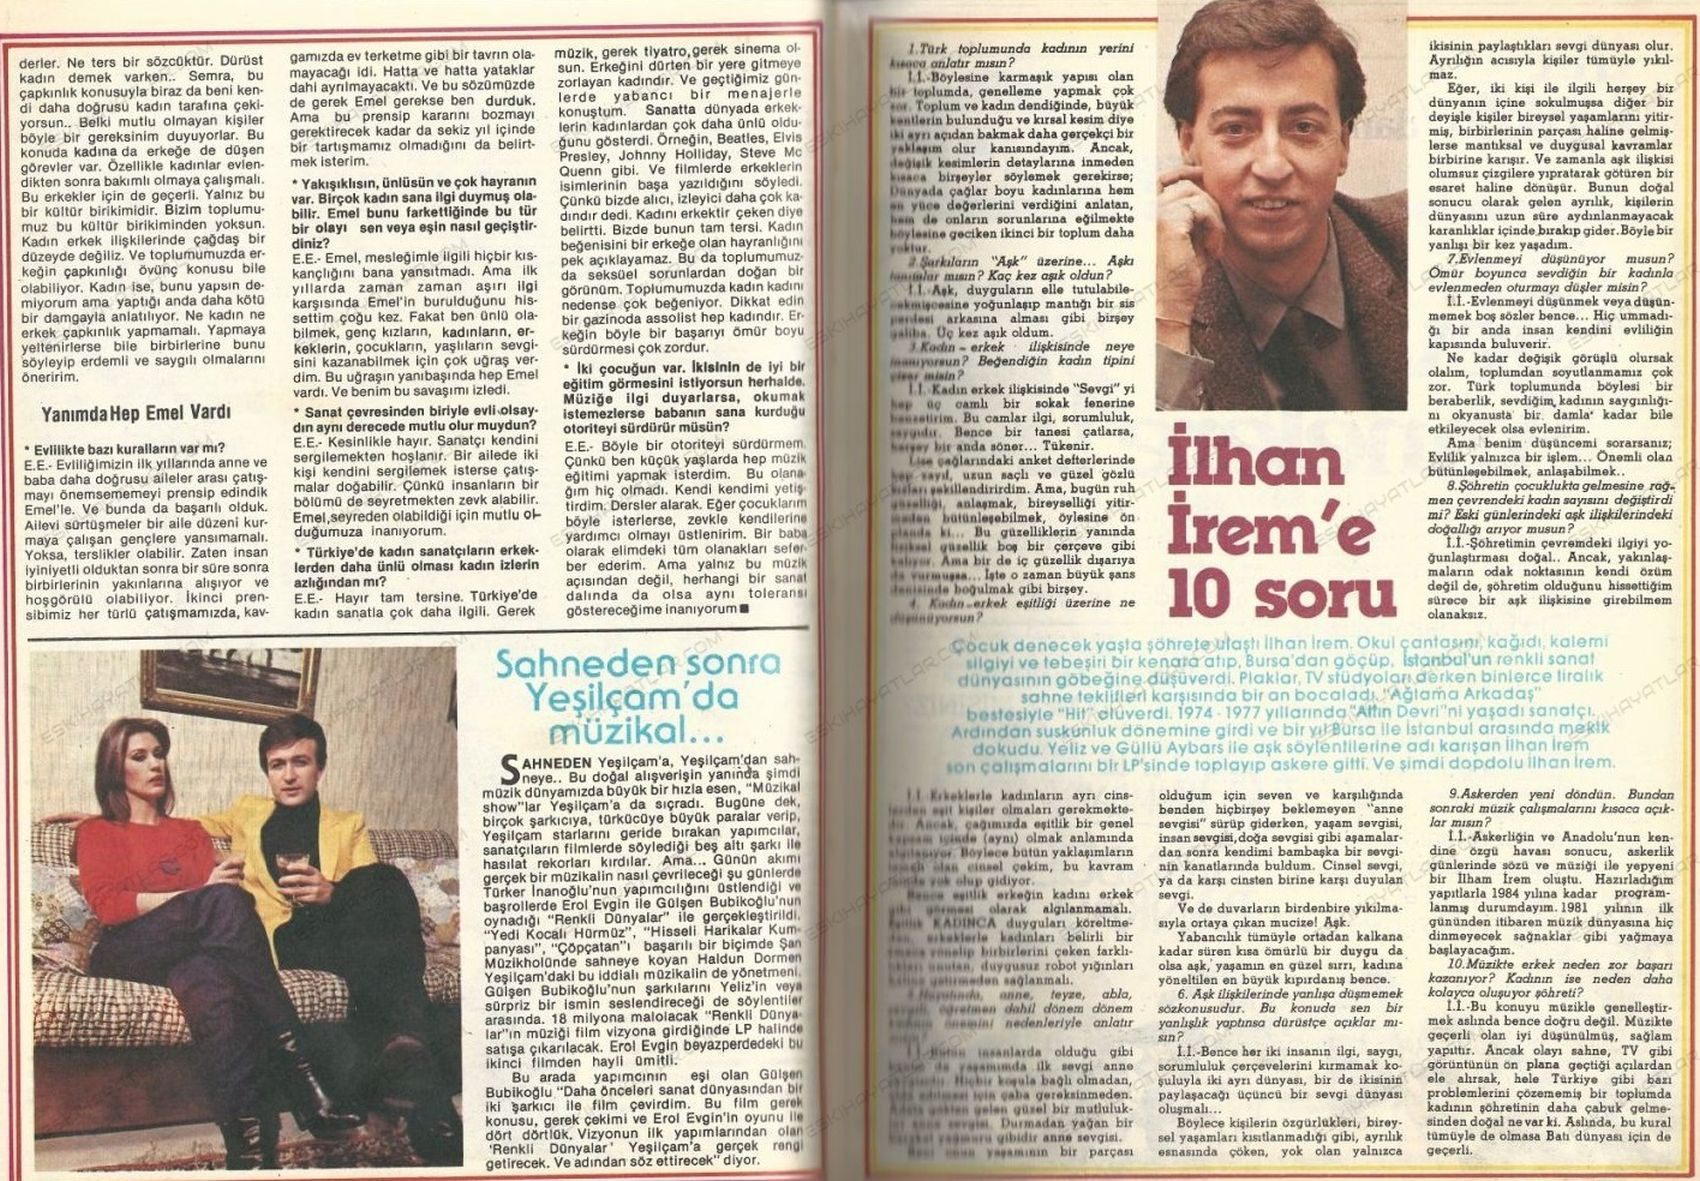 0209-erol-evgin-roportaji-1981-kadinca-dergisi (3)